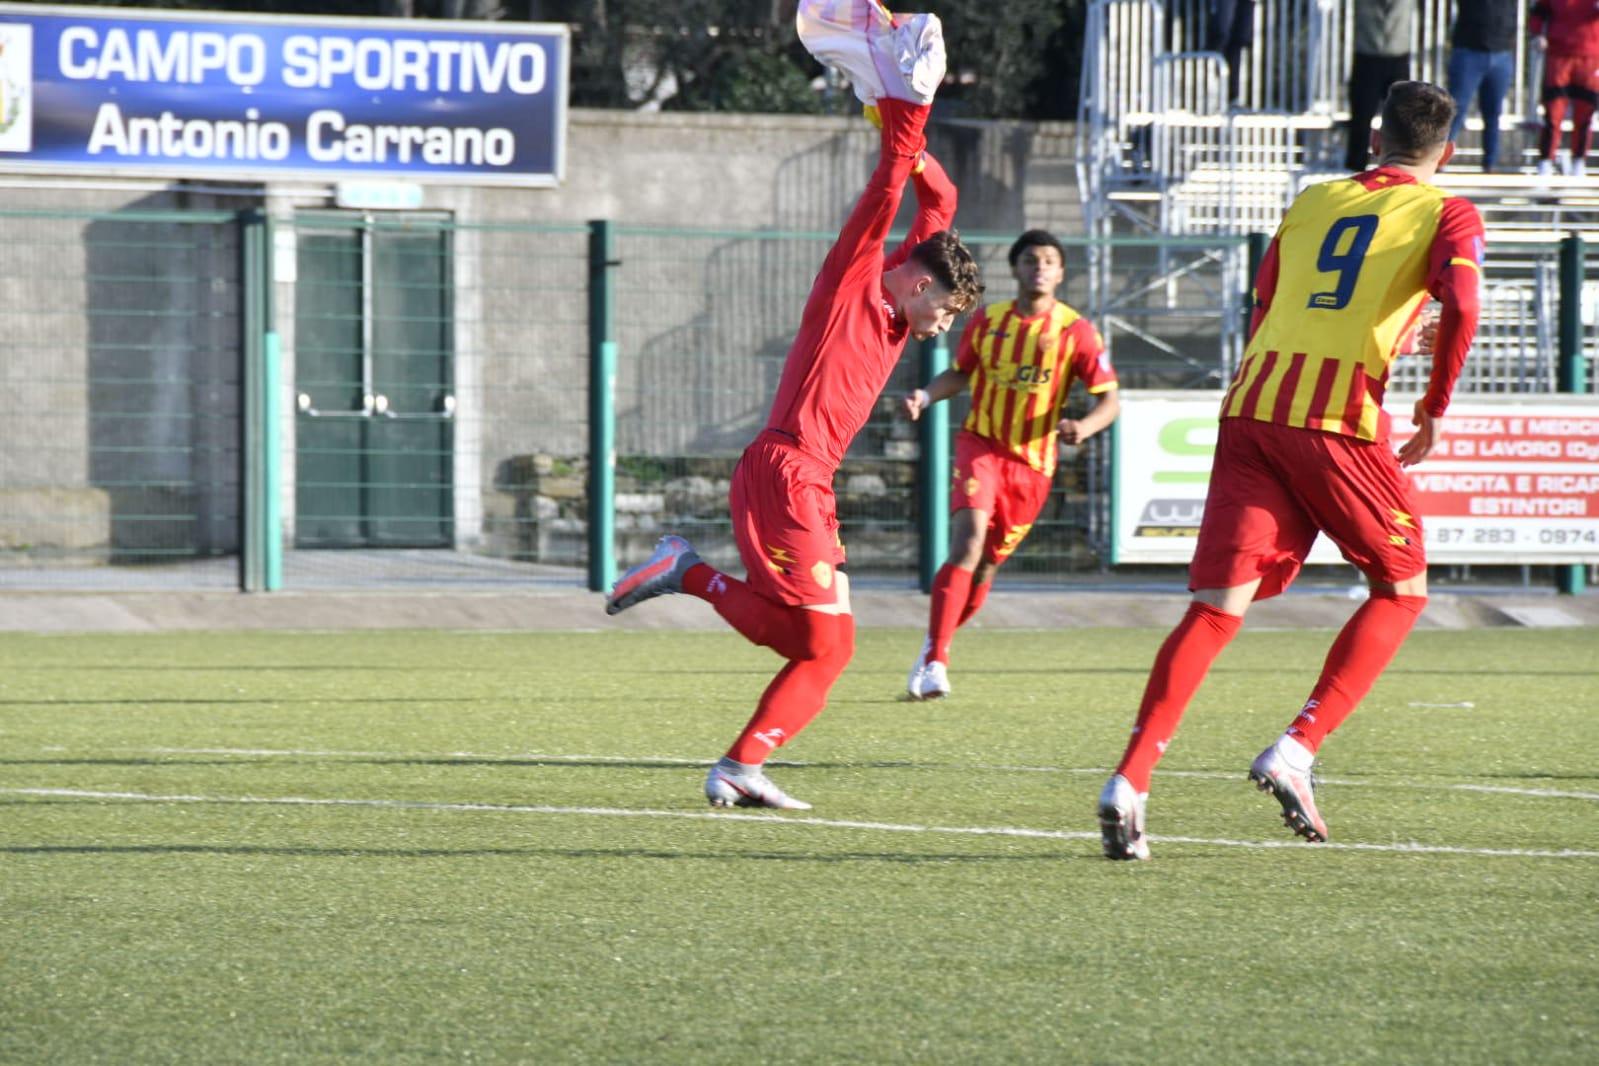 Polisportiva Santa Maria 3-0 Biancavilla, post-gara con Vincenzo Romano